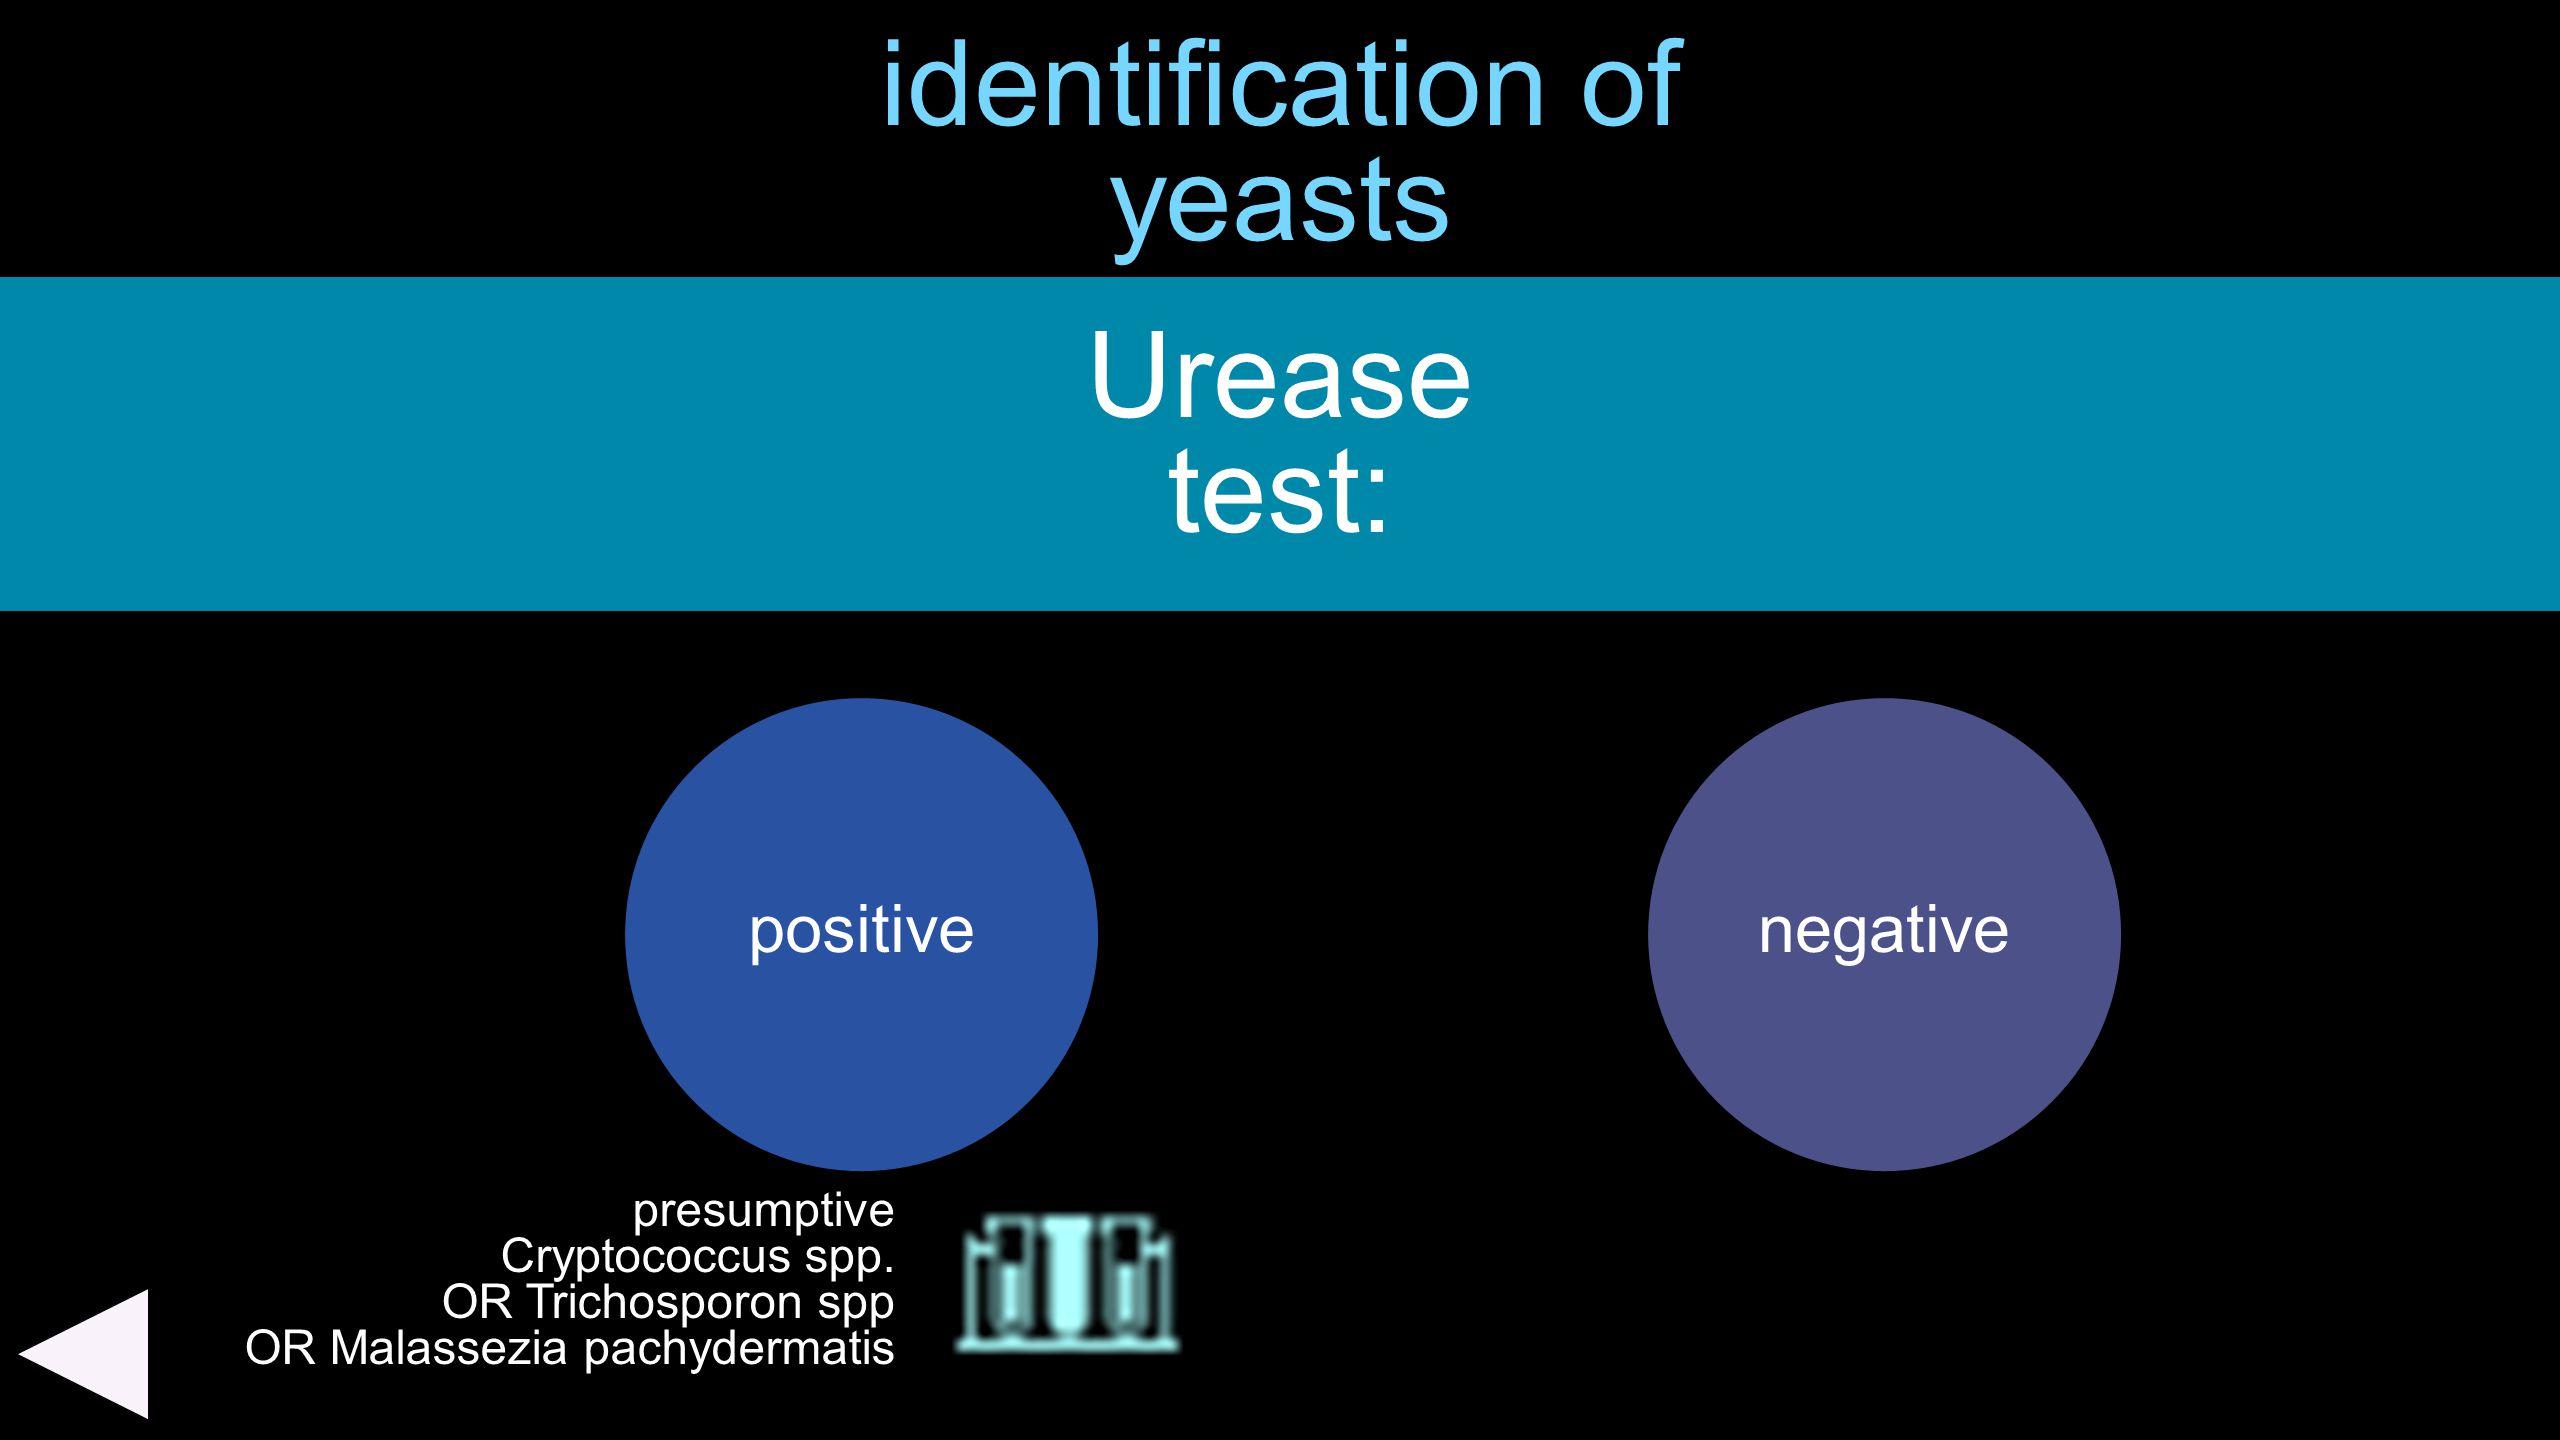 identification of yeasts Urease test: positivenegative presumptive Cryptococcus spp. OR Trichosporon spp OR Malassezia pachydermatis